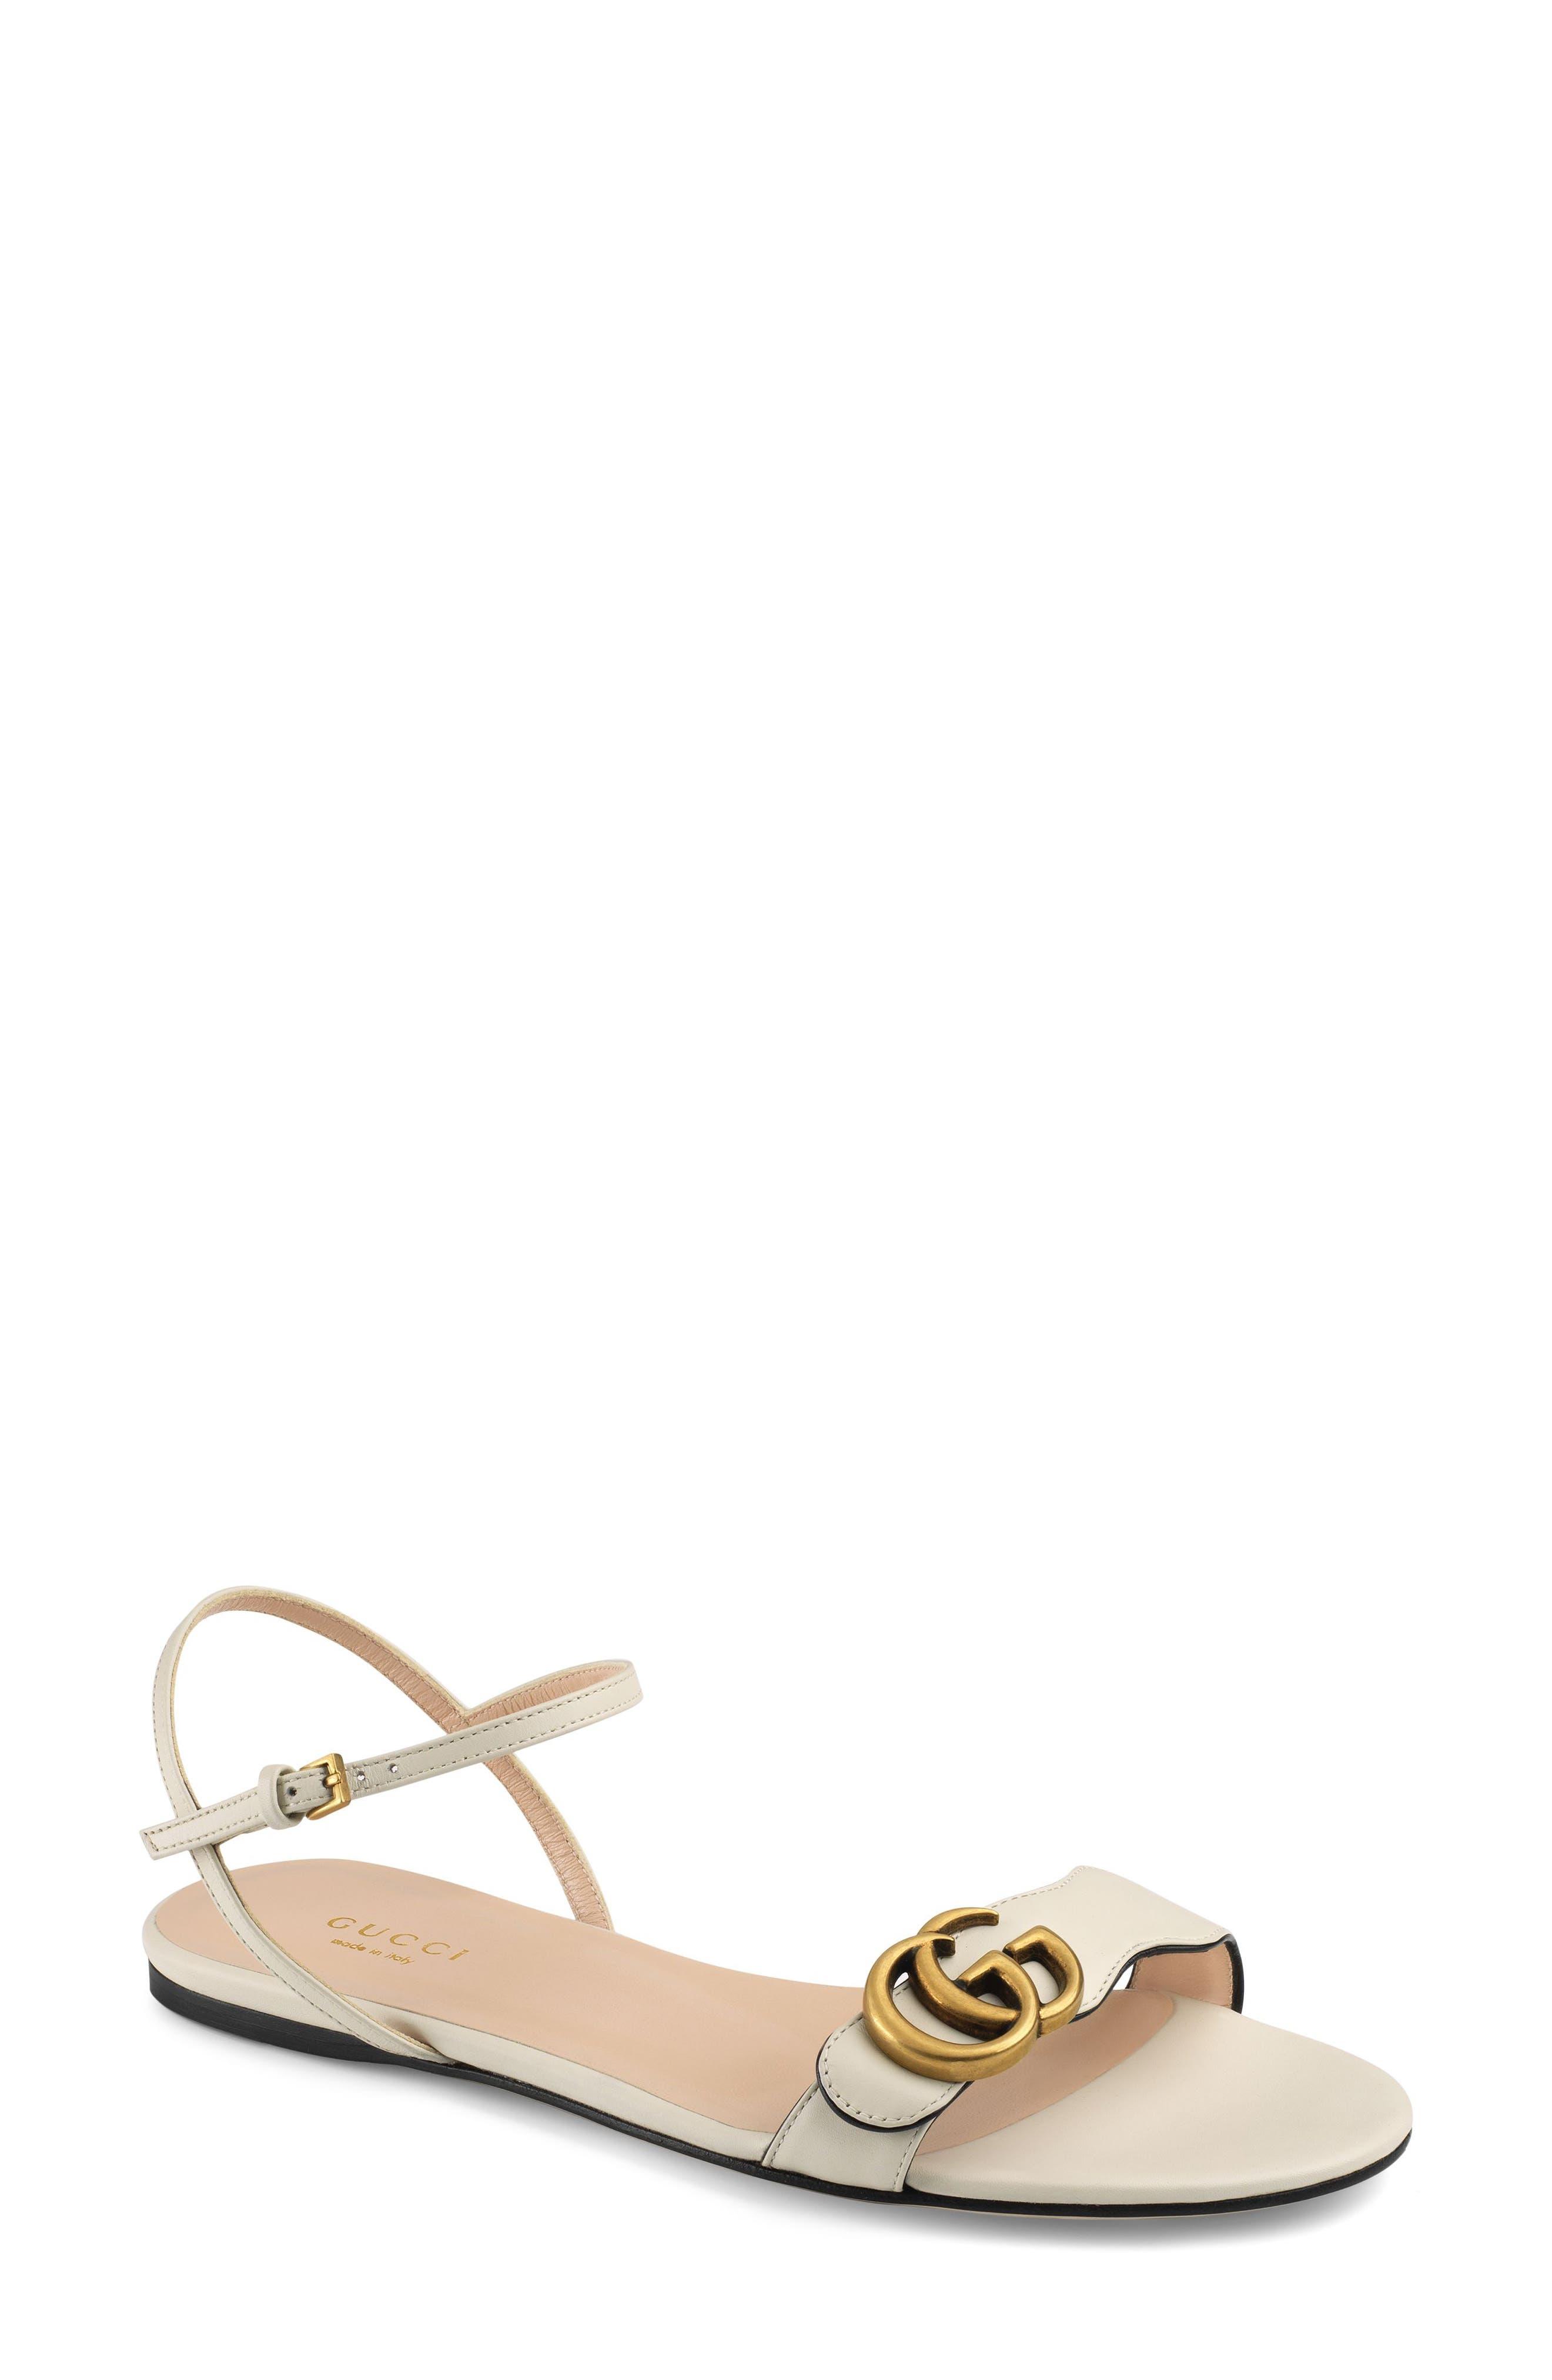 Women's Gucci Sandals and Flip-Flops